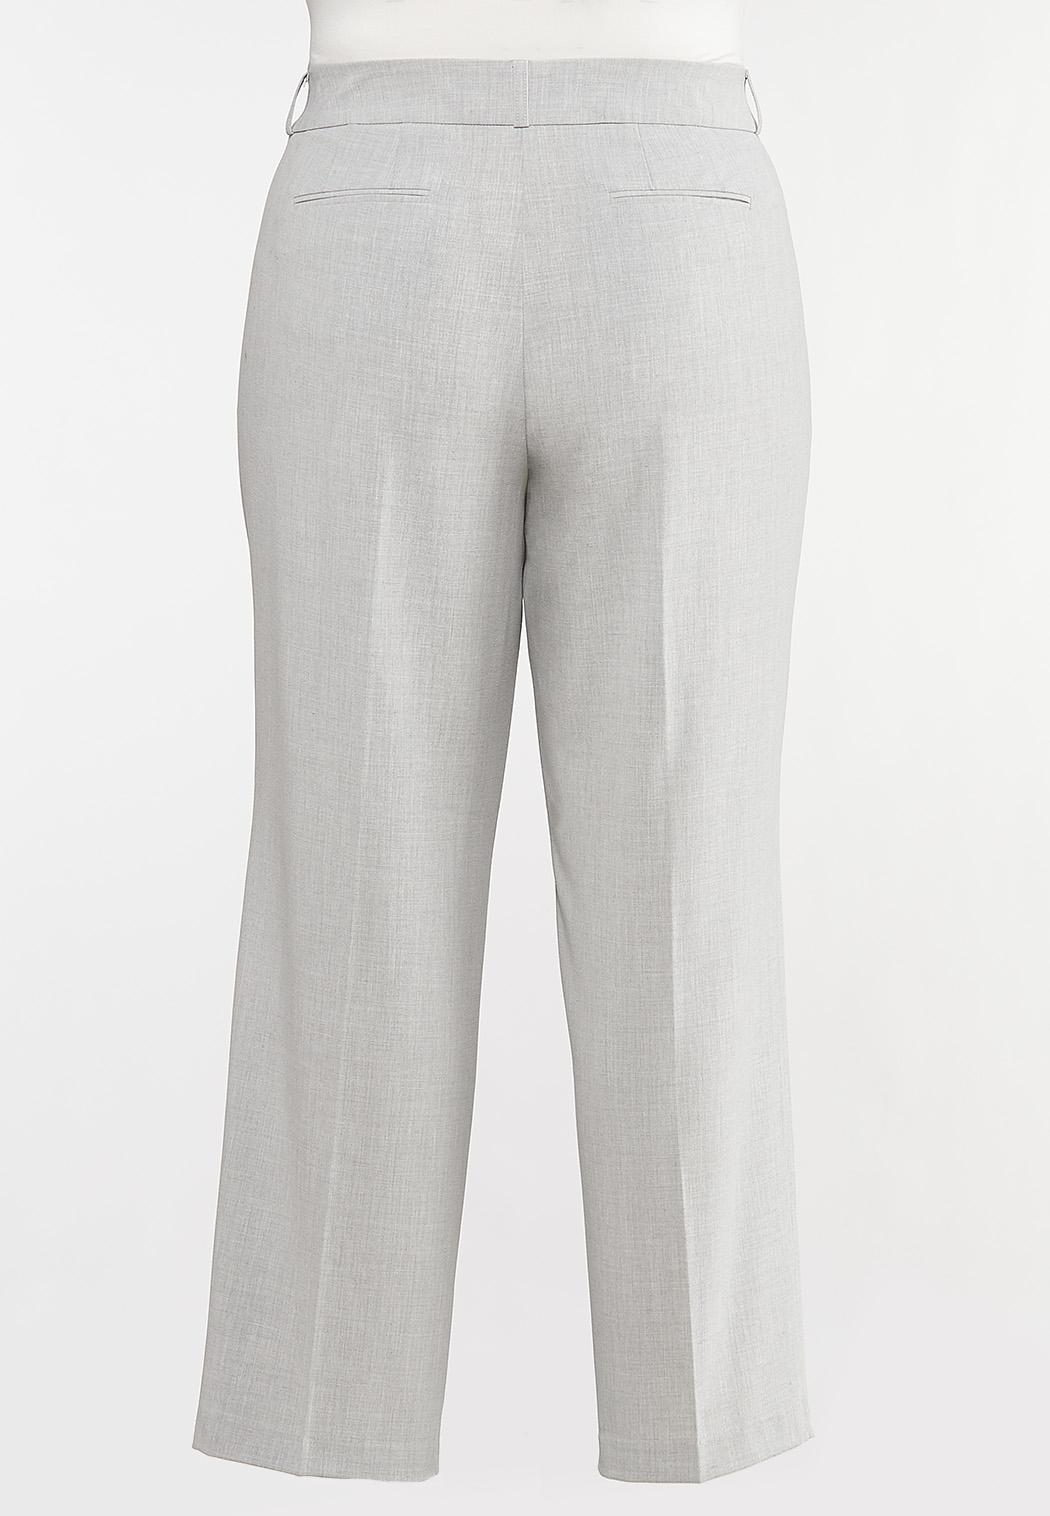 Plus Petite Gray Trouser Pants (Item #44374233)